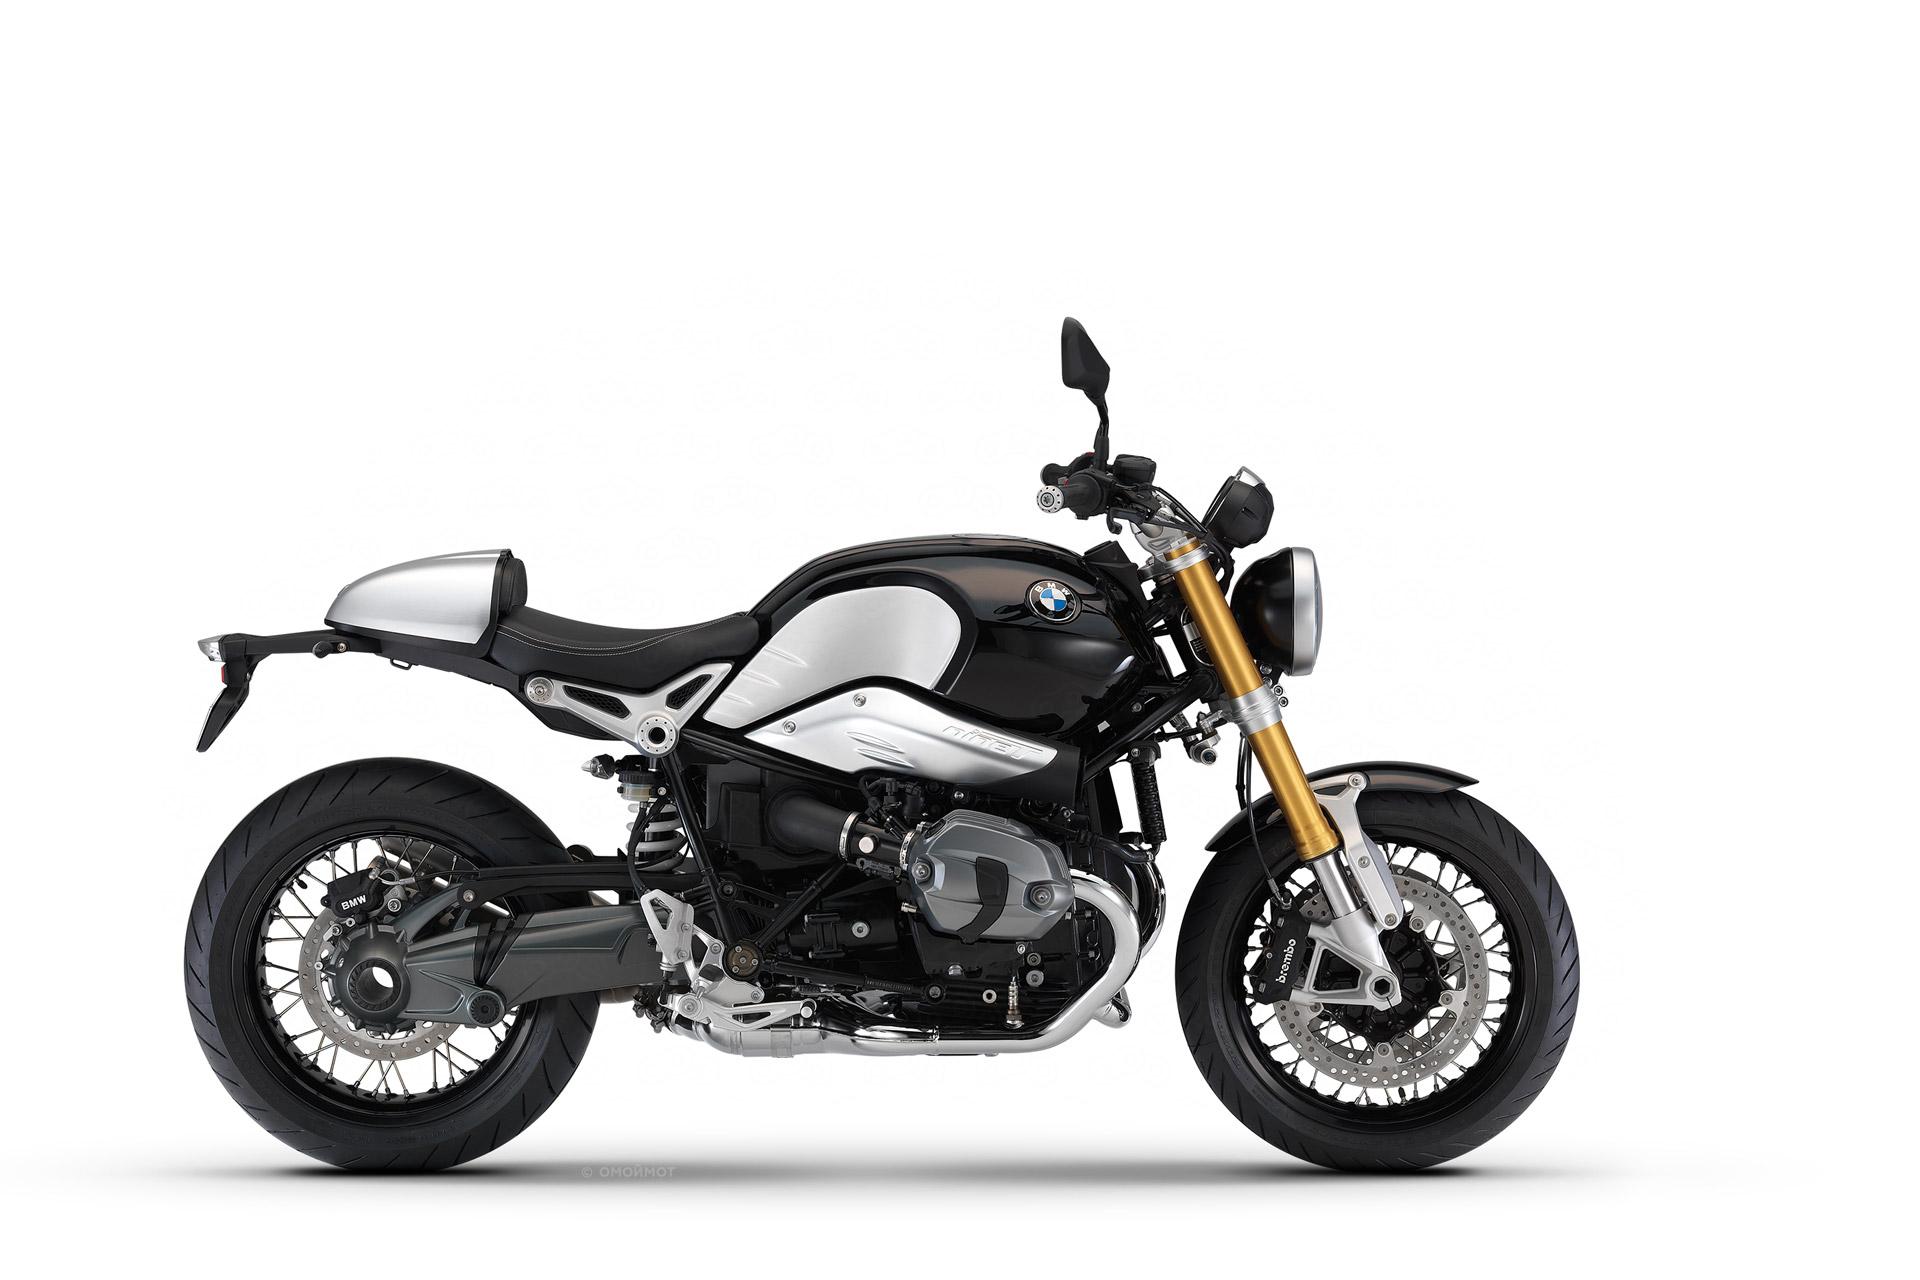 Мотоцикл BMW S 1000 RR - Avto-Russia.ru